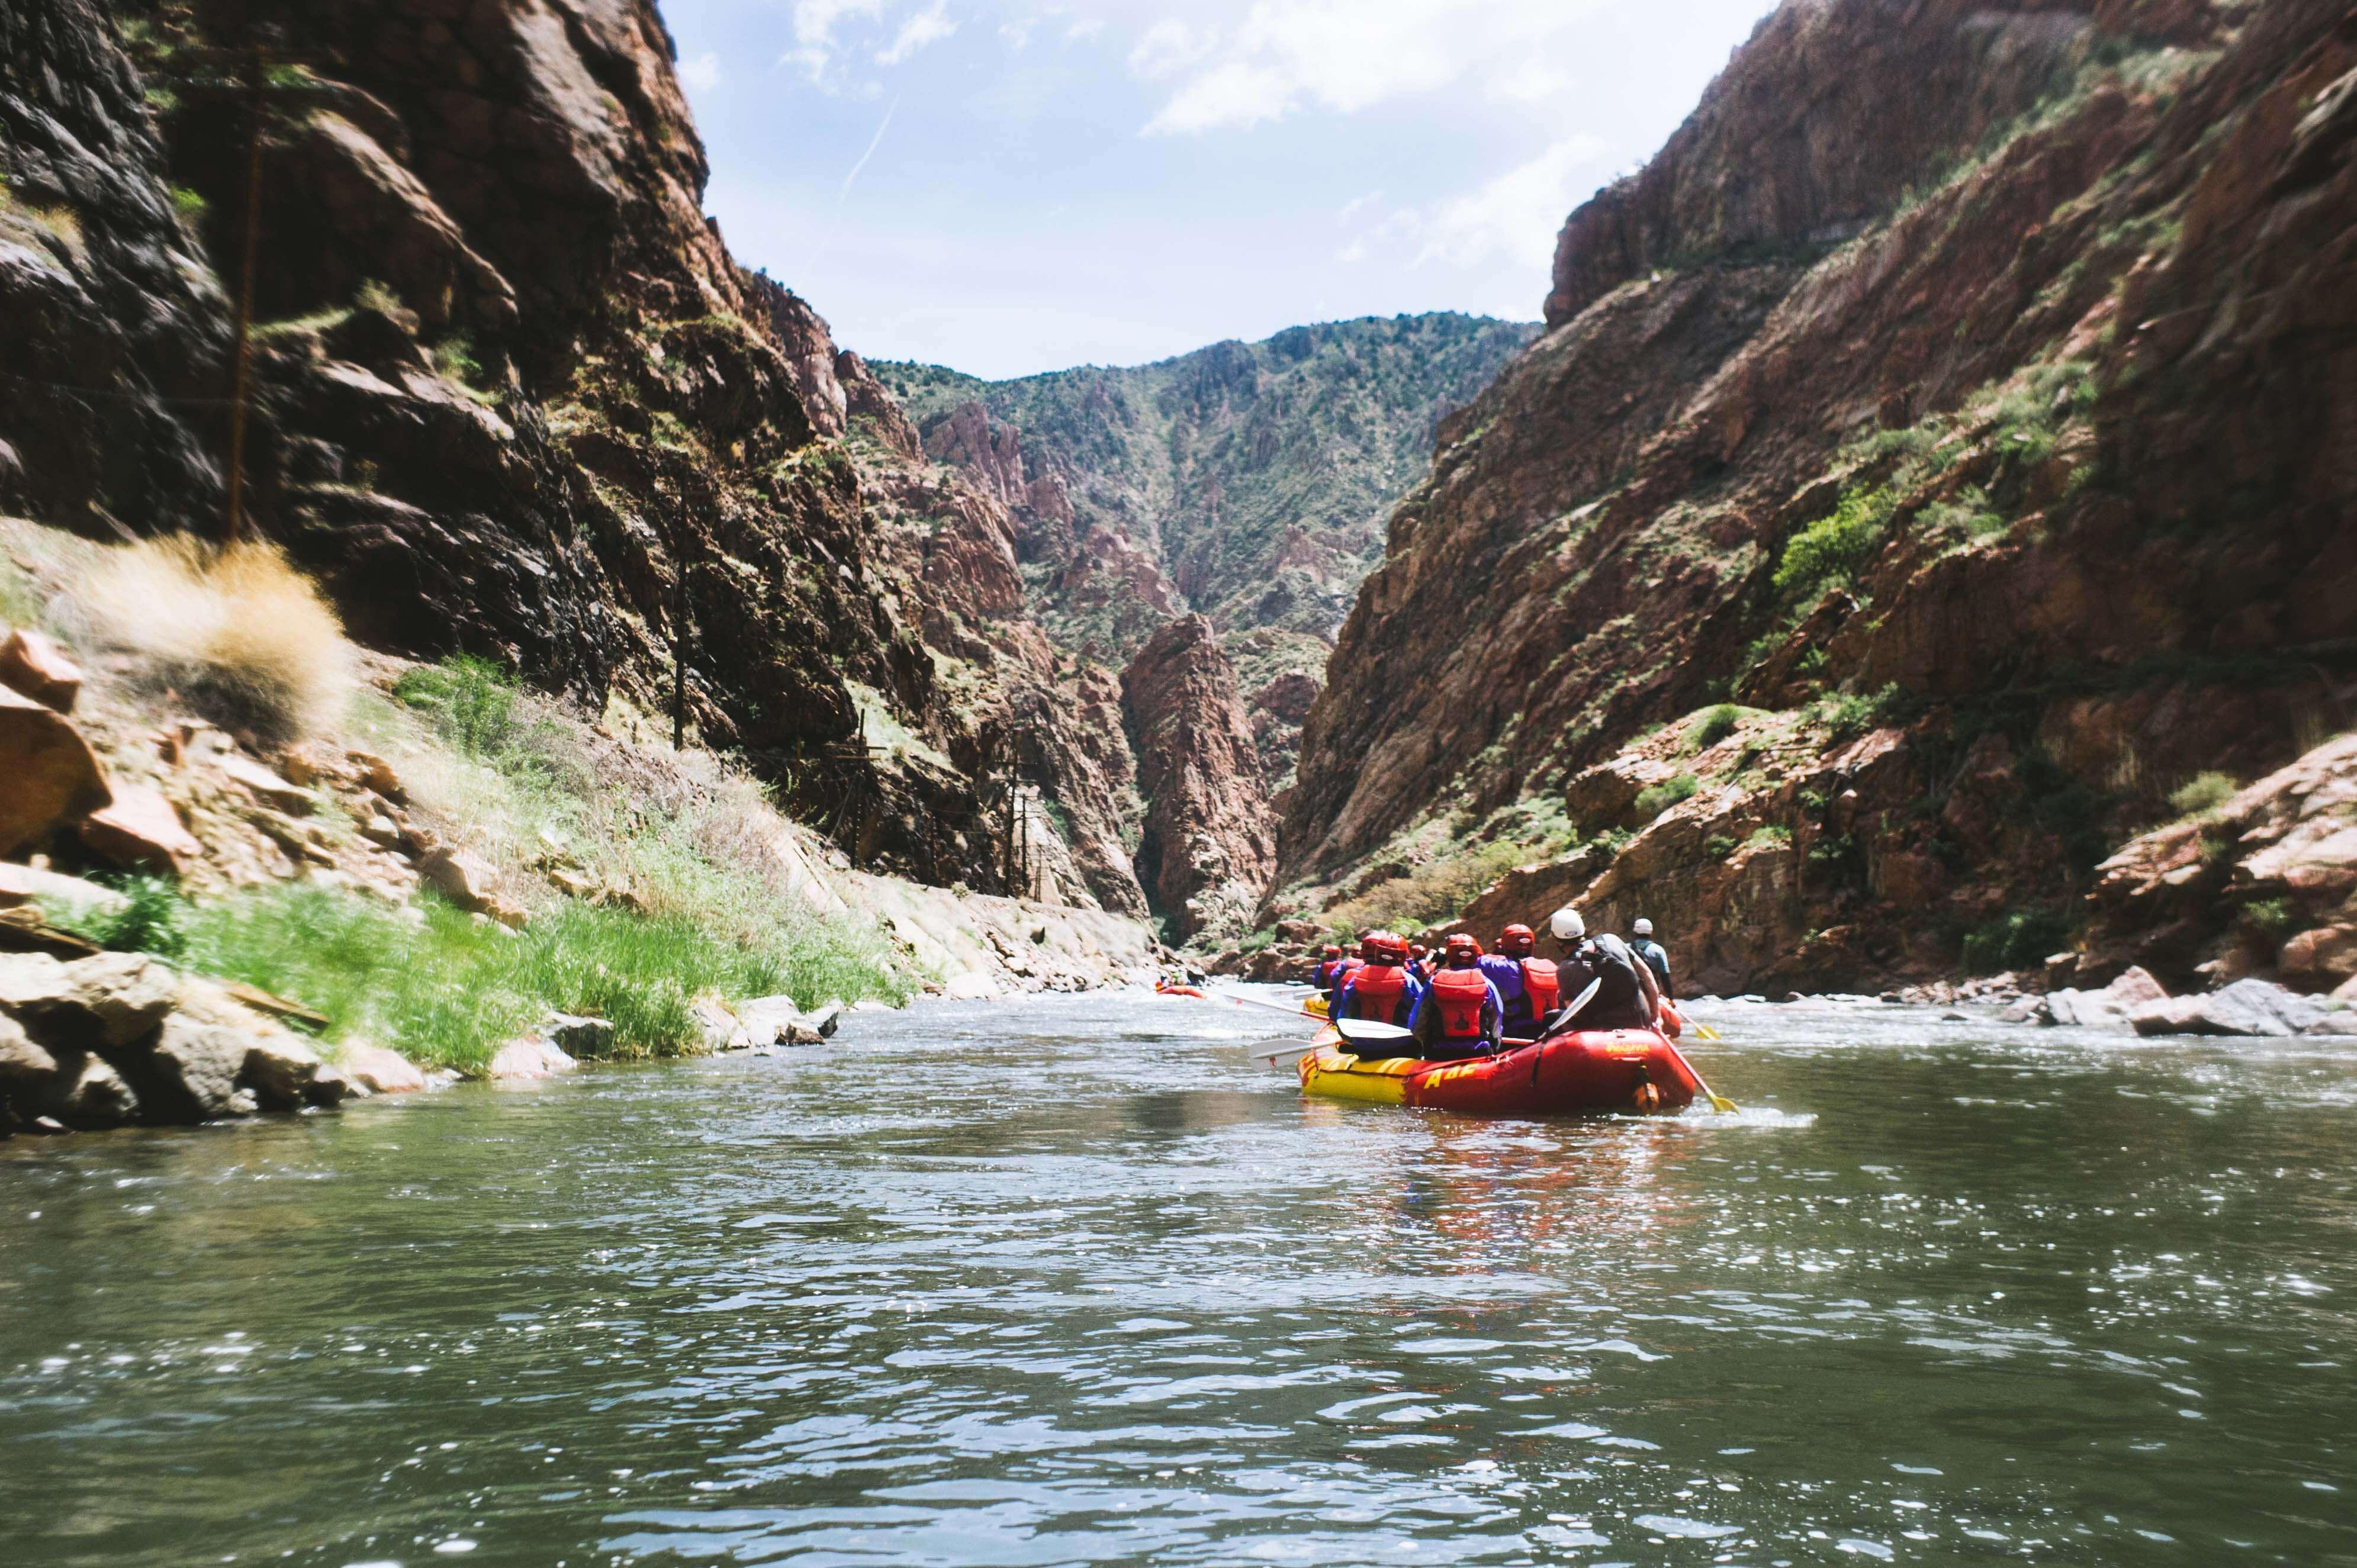 memories from rafting team bonding activity